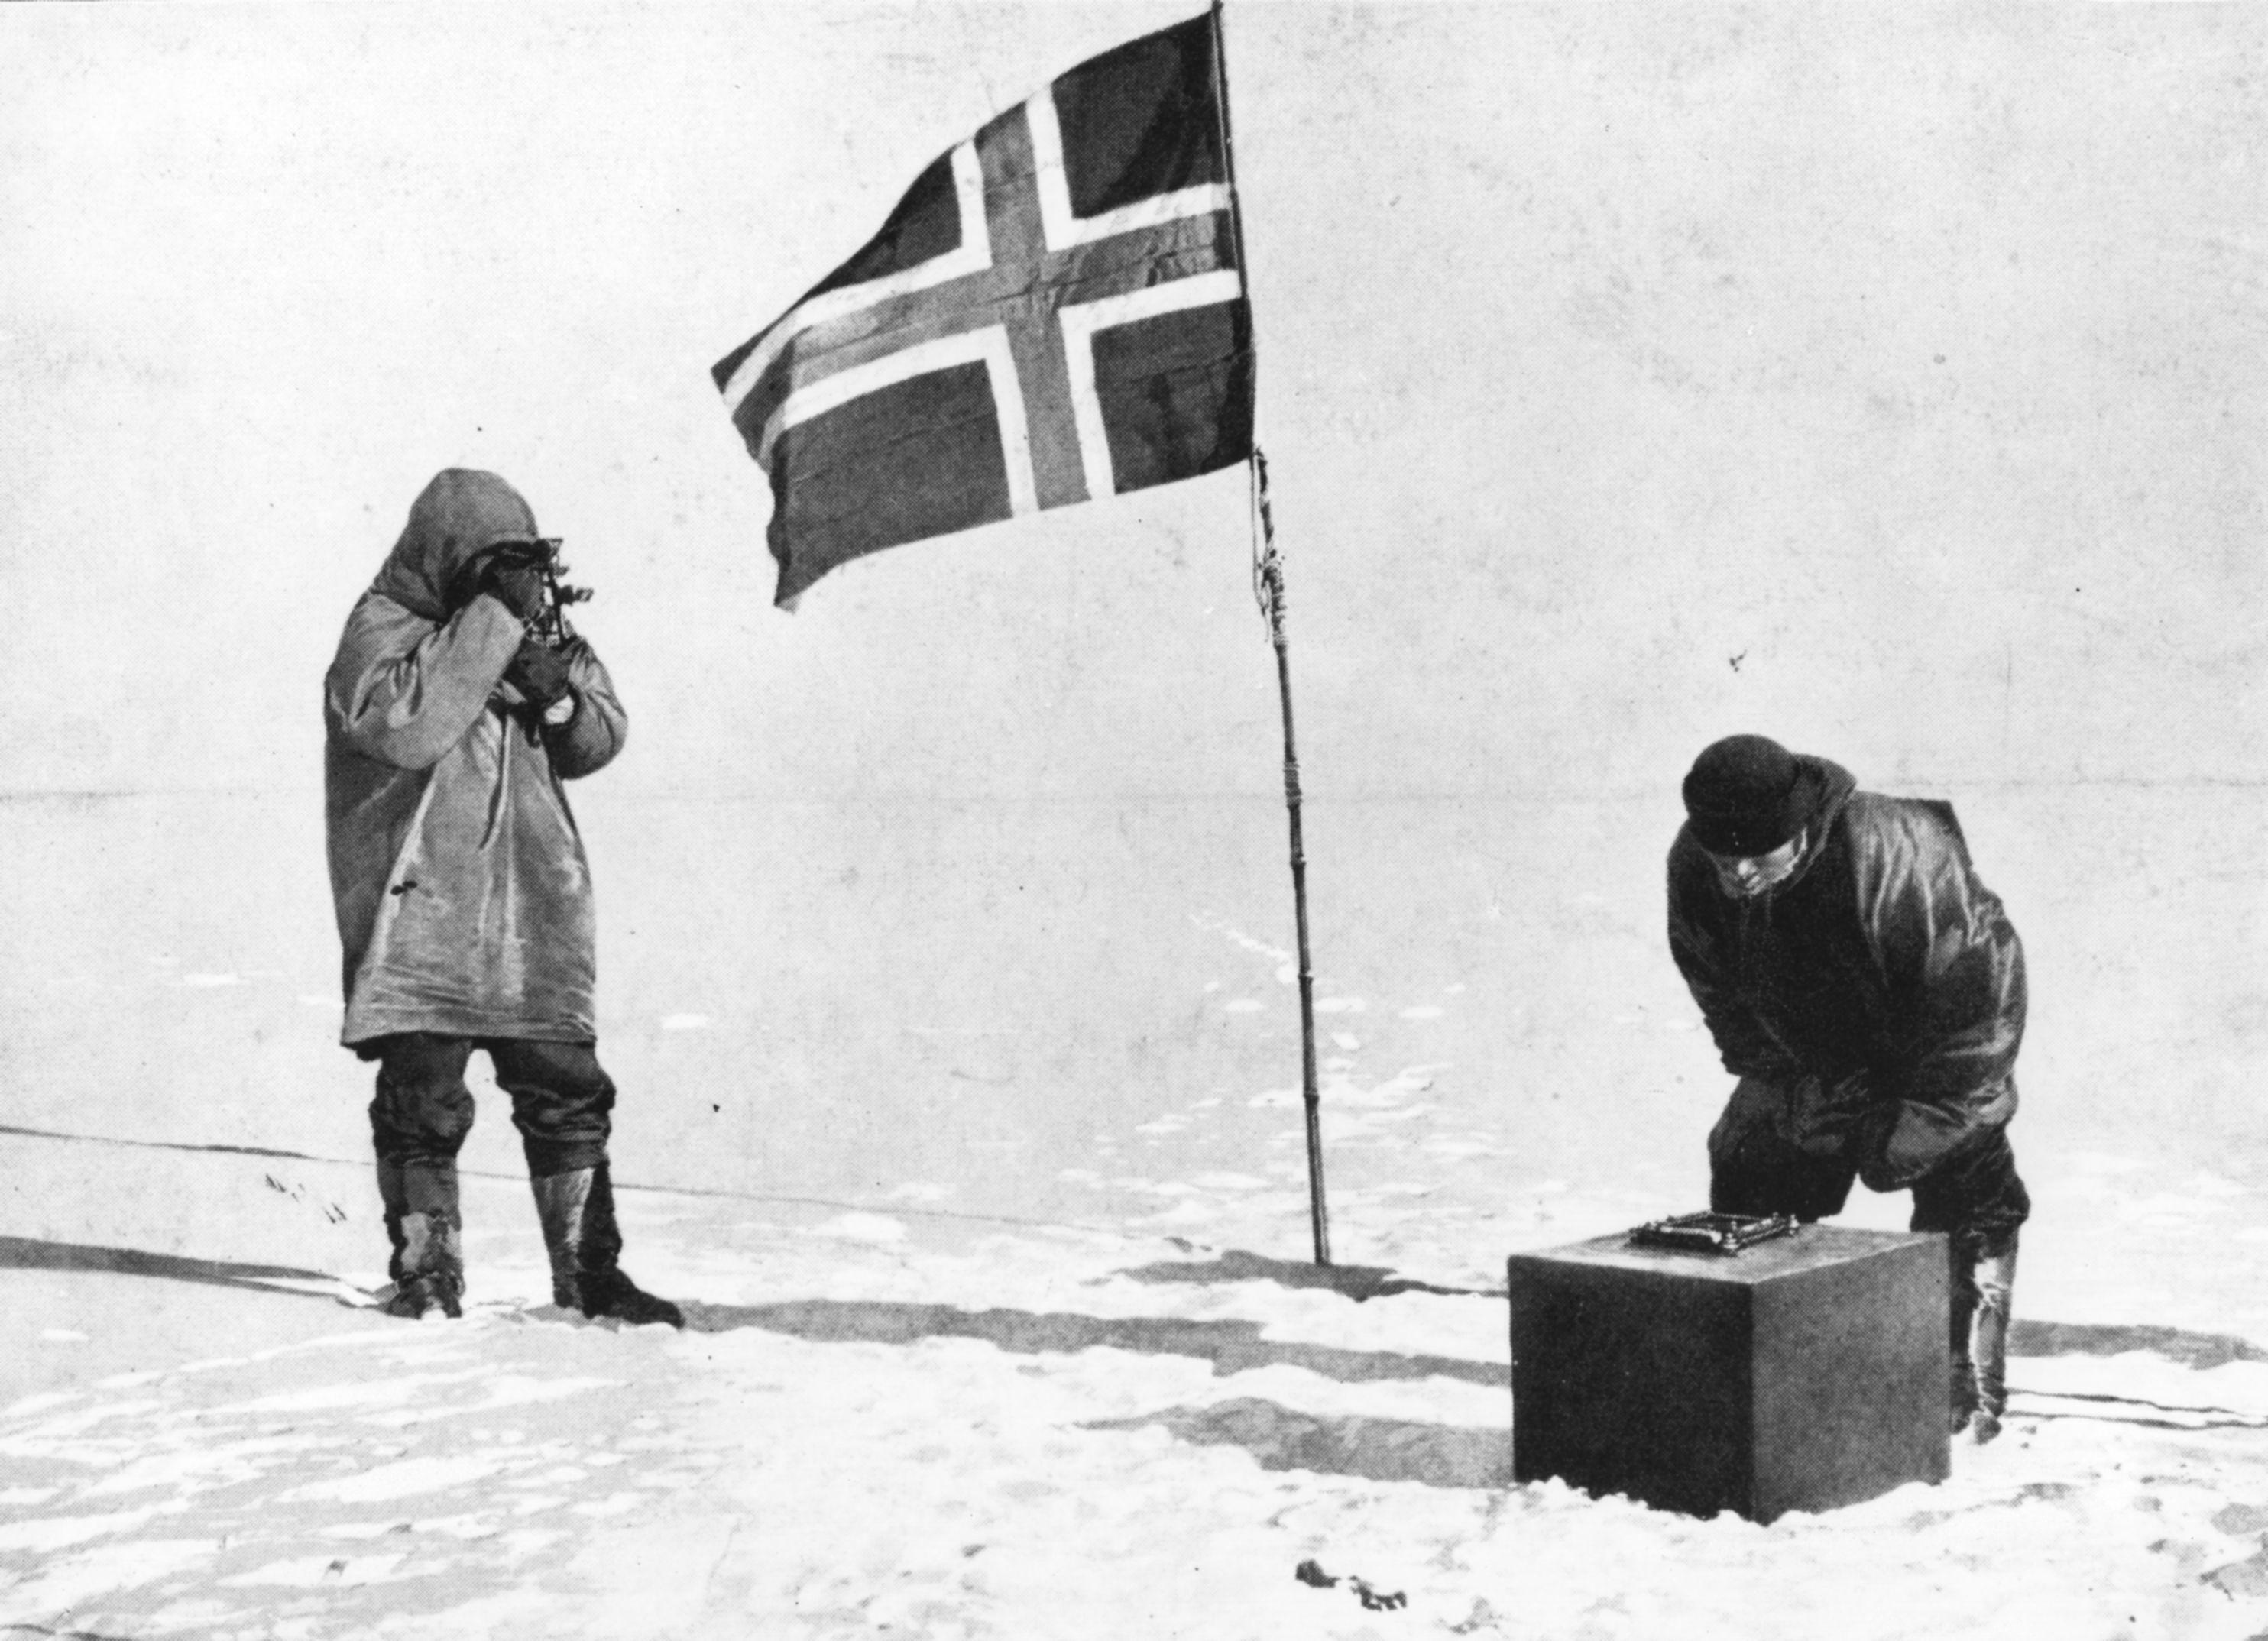 Norwegian explorer Captain Roald Amundsen taking sights at the South Pole, beside the Norwegian flag.   (Illustrated London News/Getty)